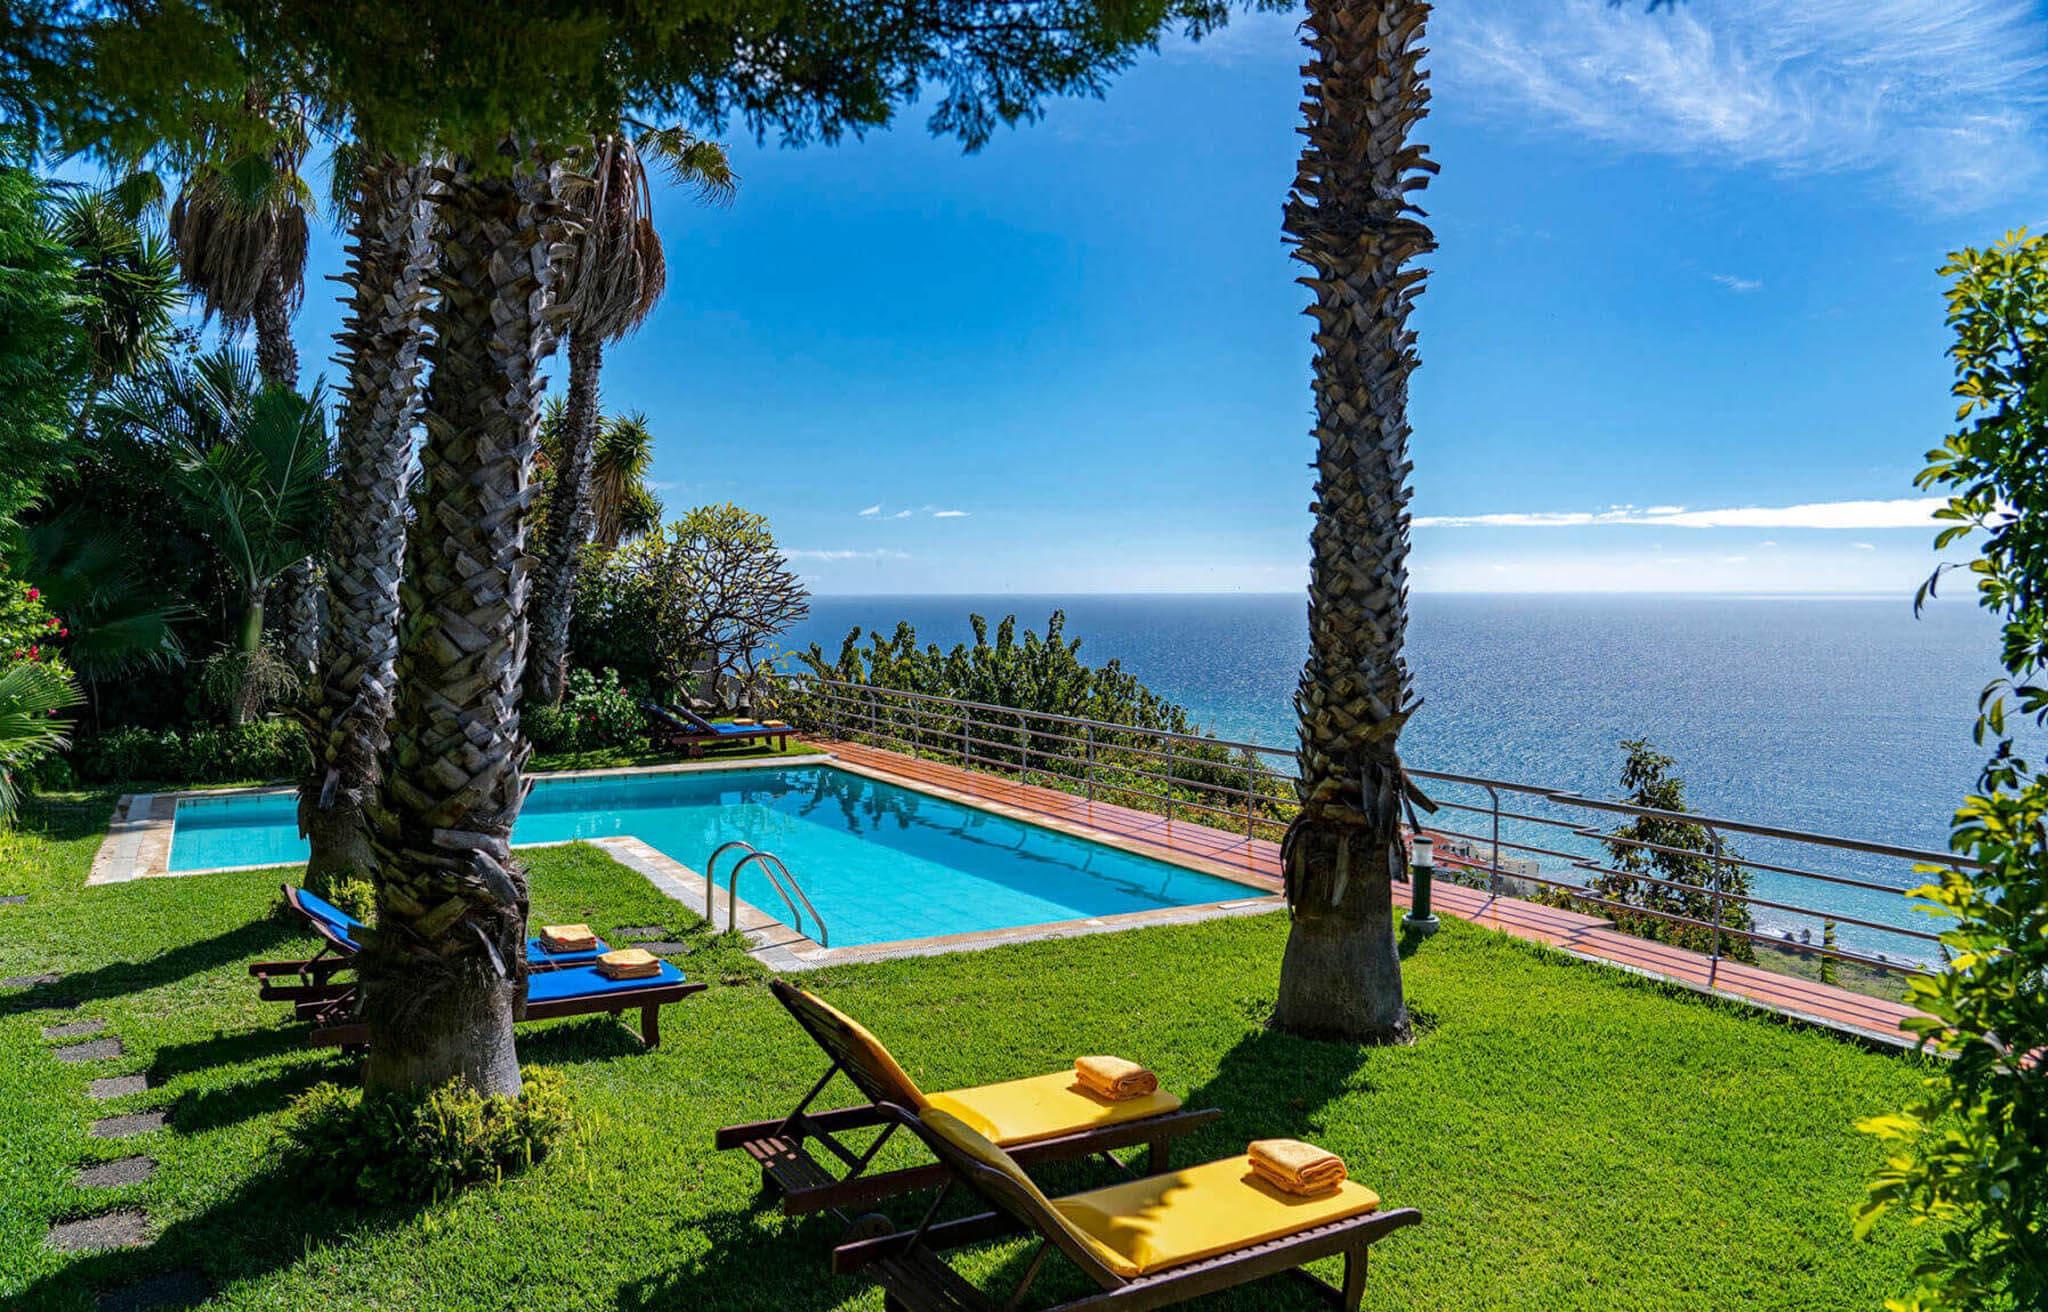 Casa do Papagaio Verde - Bed & Breakfast in Madeira Island